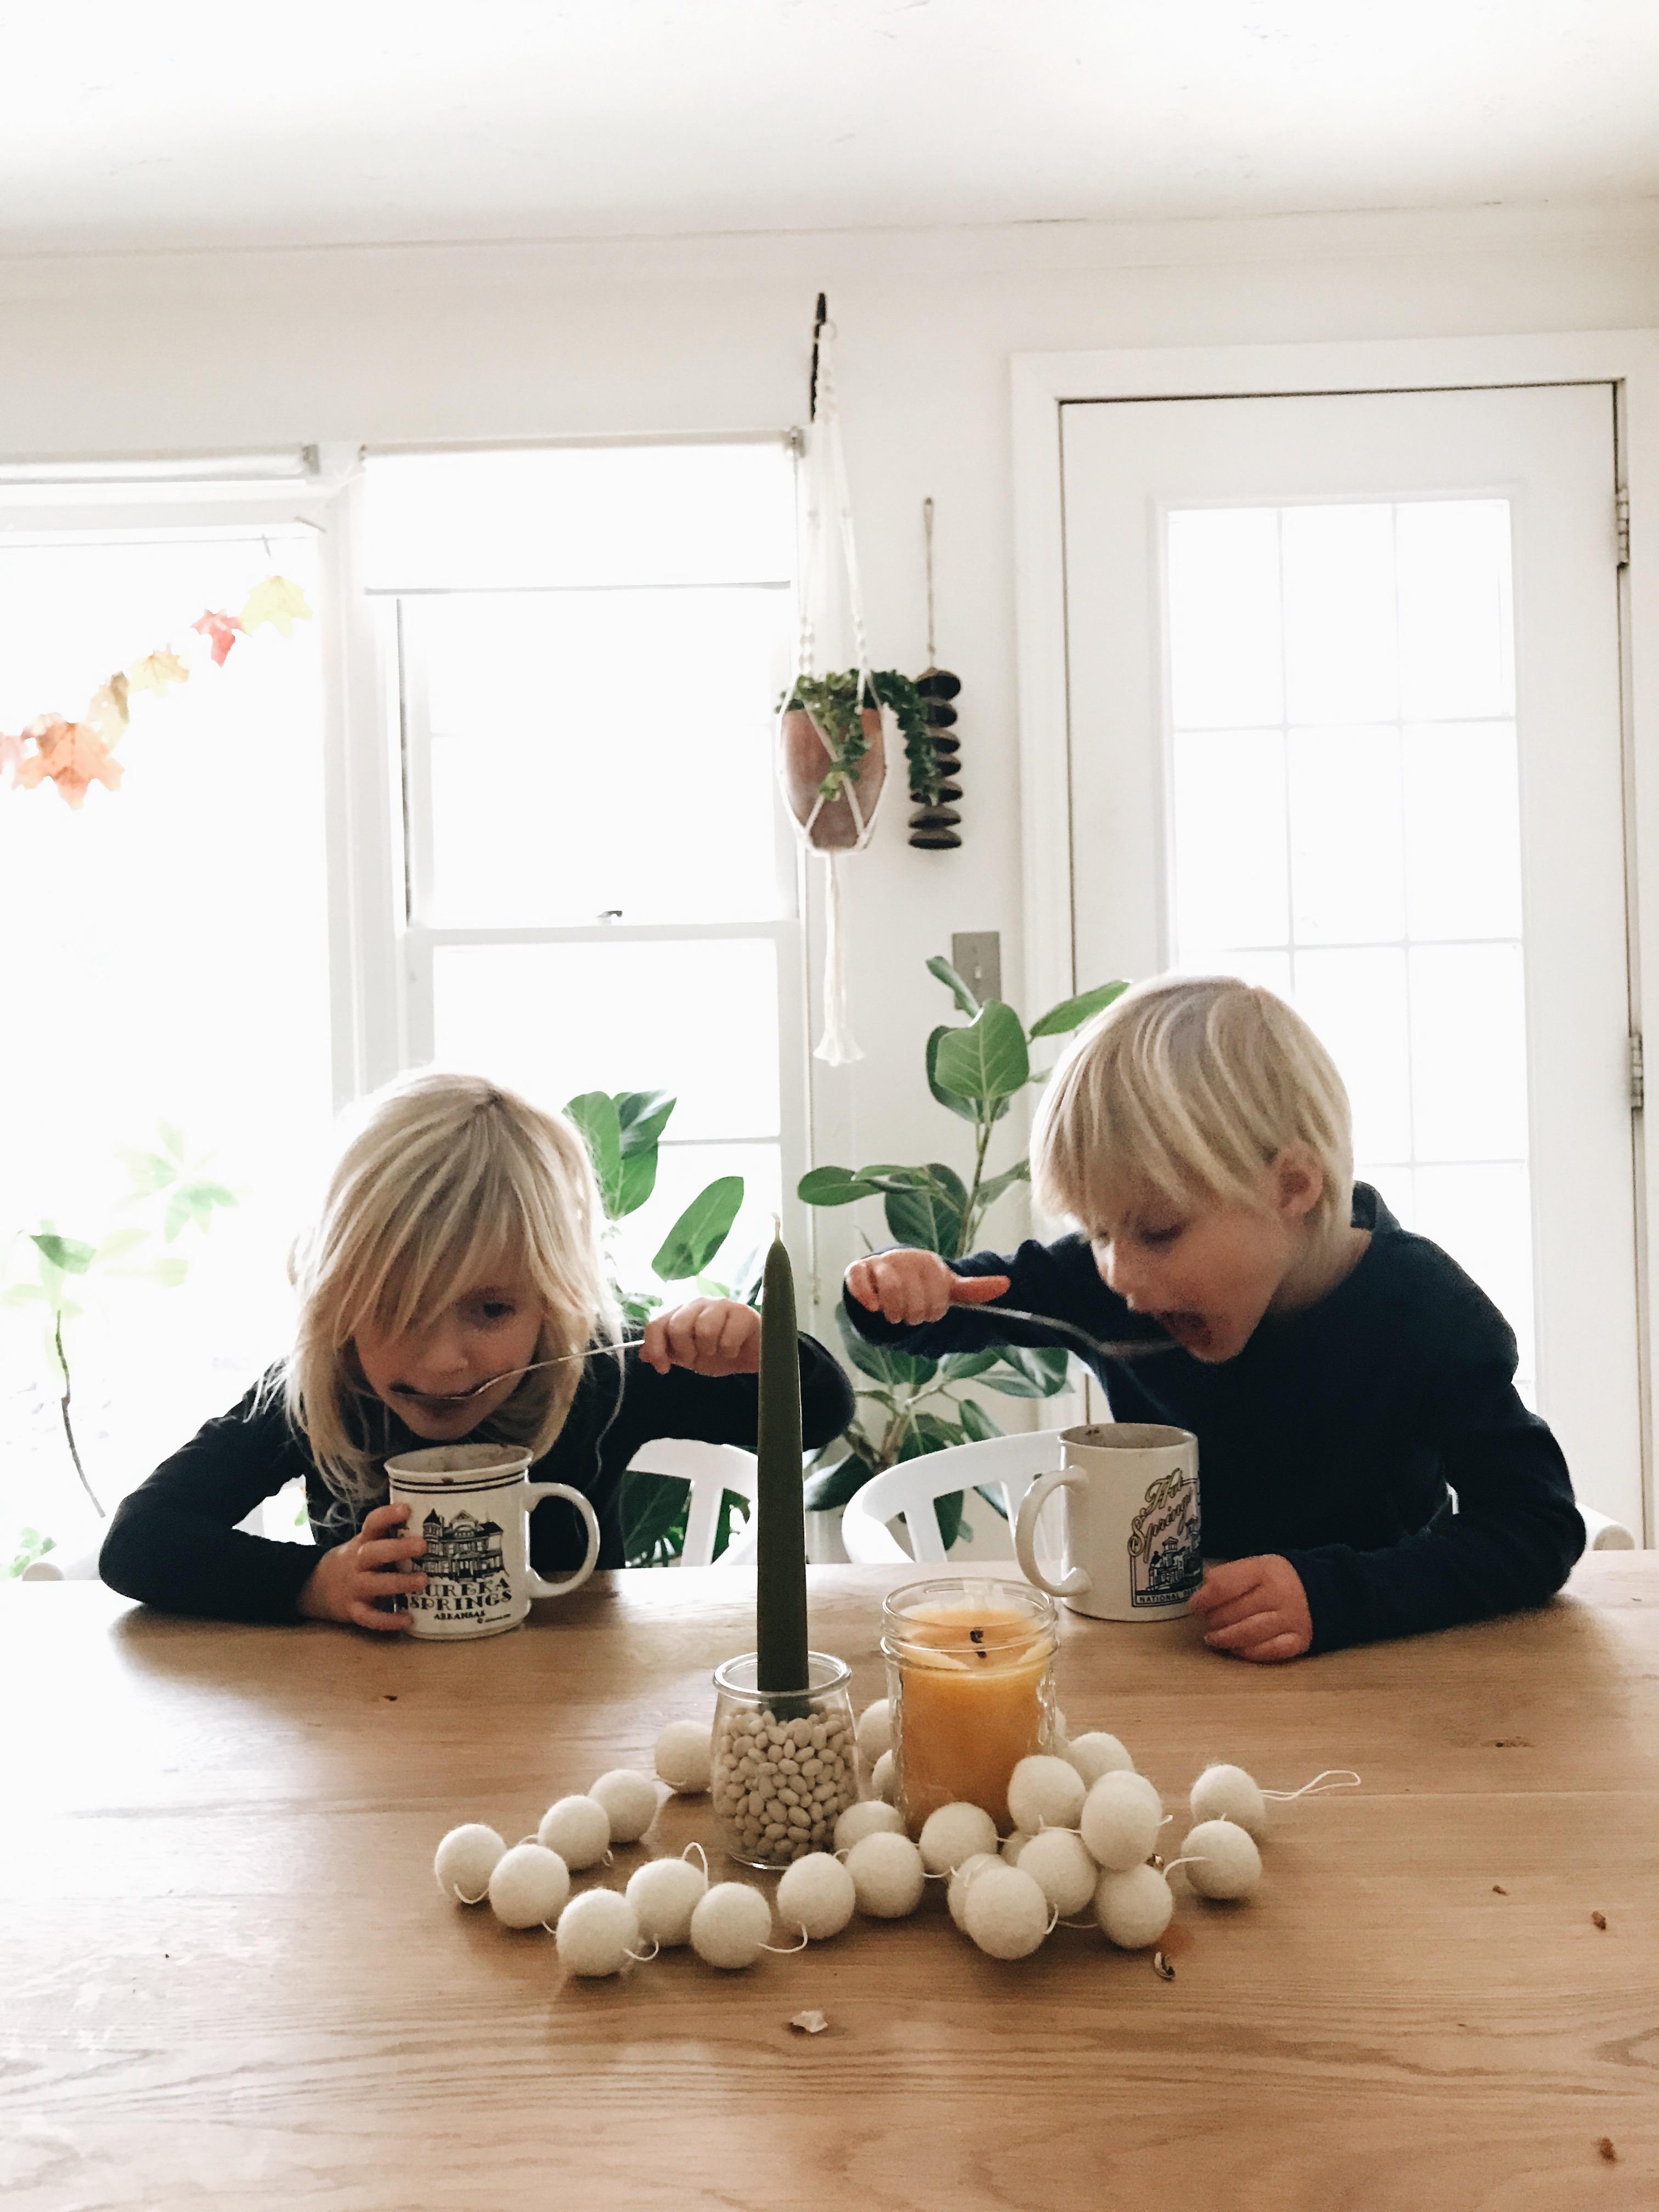 blurry kids drinking hot chocolate